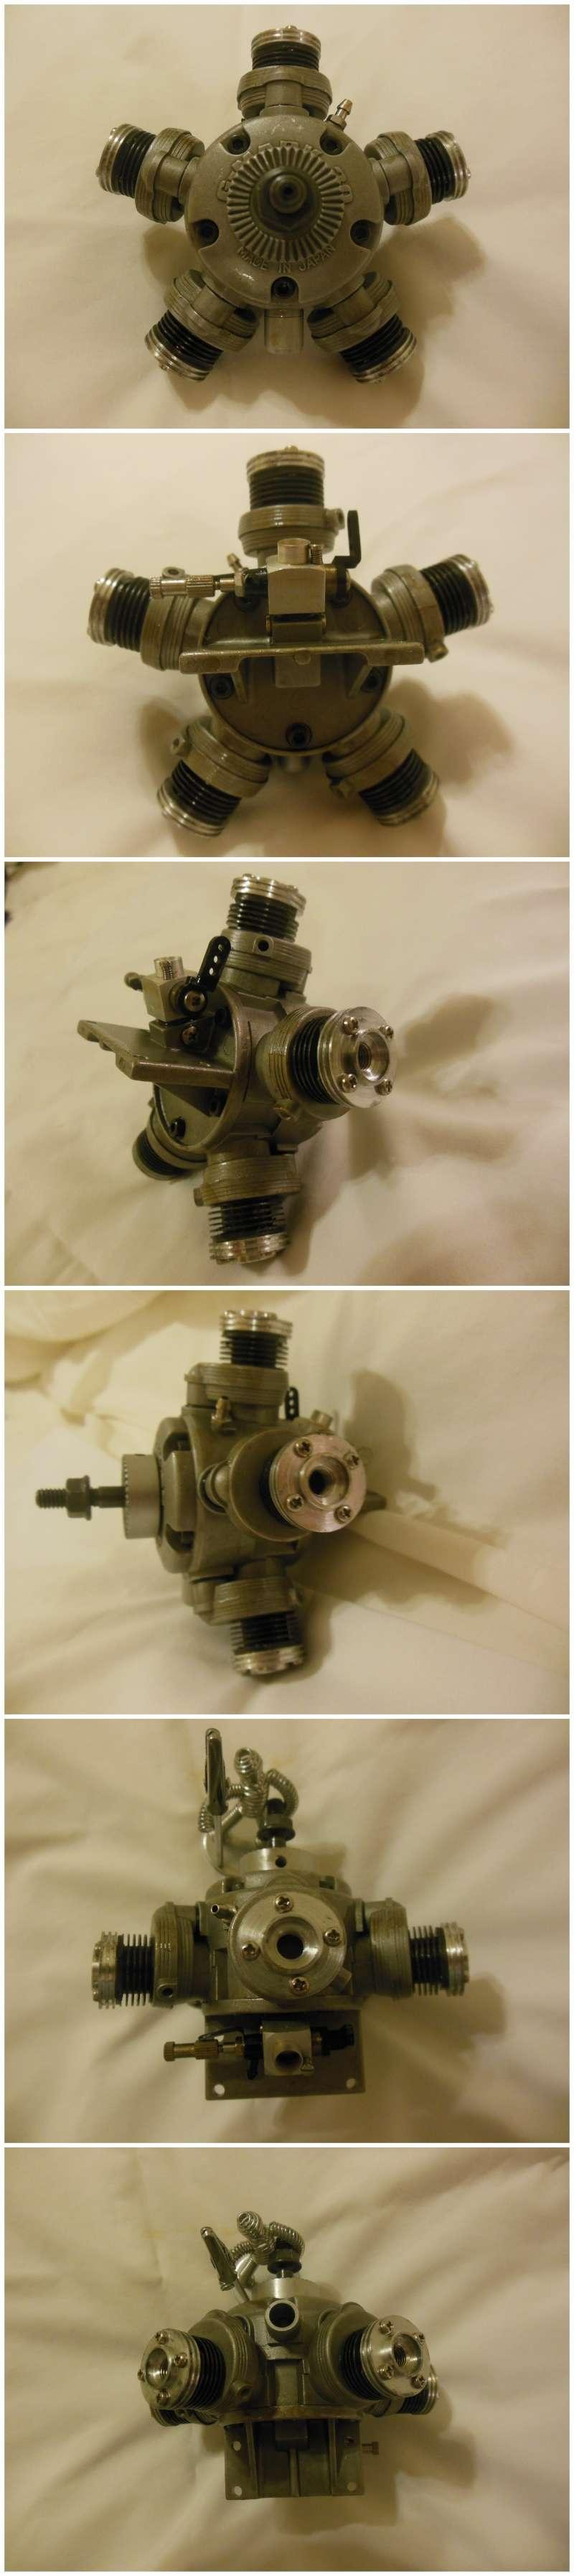 G-Mark 5 Cylinder Radial .030 G-mark11